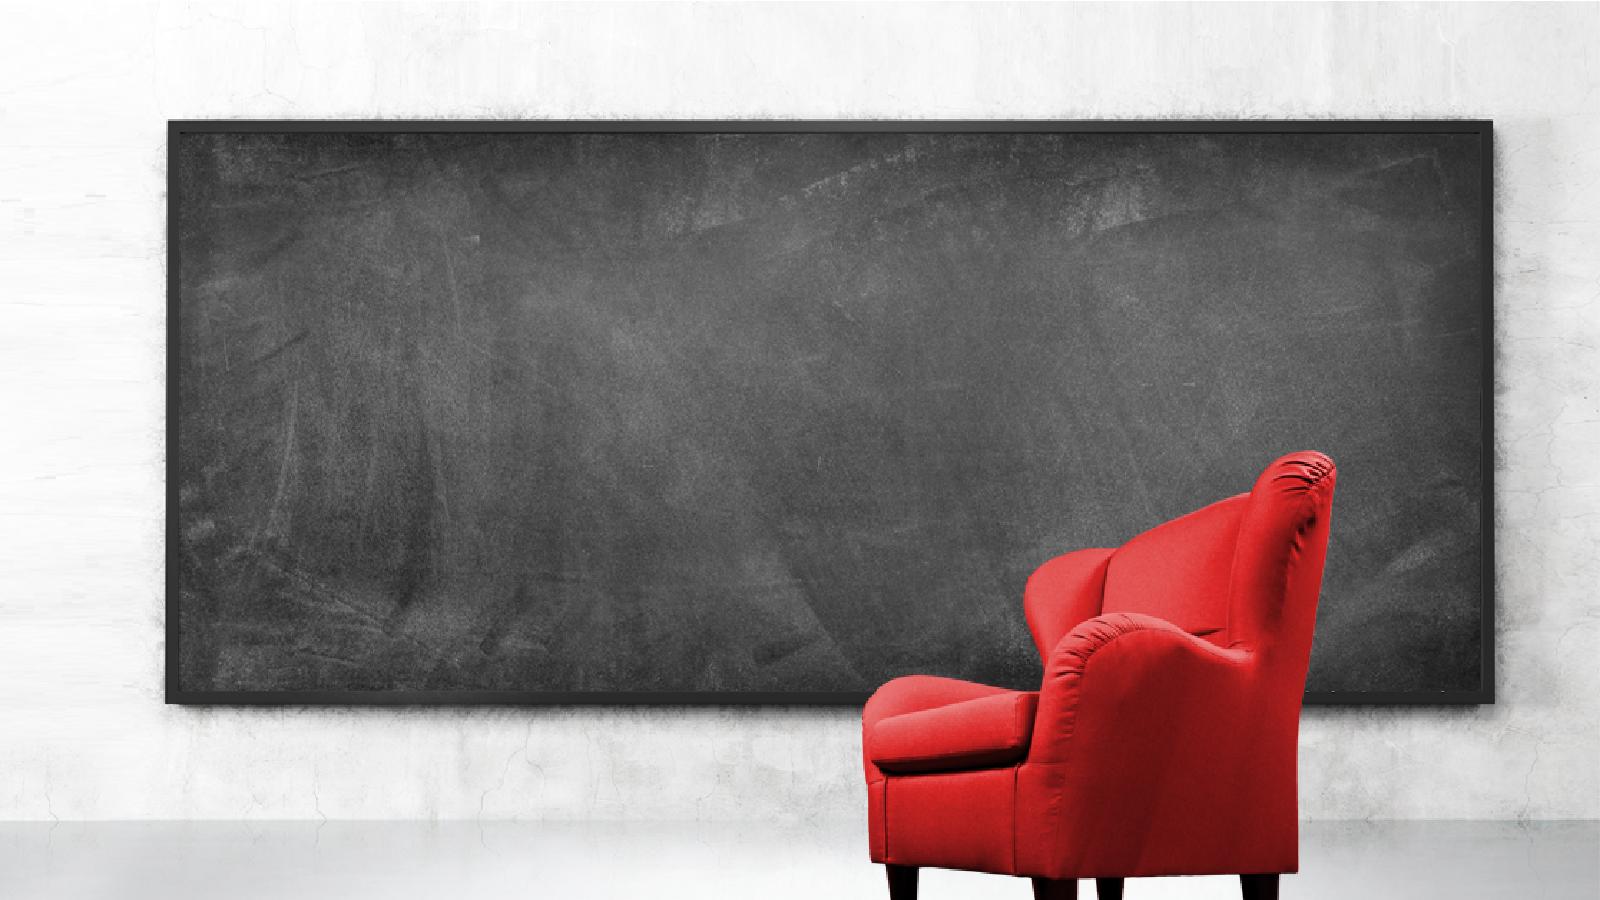 finanzieller analphabetismus geht uns alle an accenture banken blog. Black Bedroom Furniture Sets. Home Design Ideas